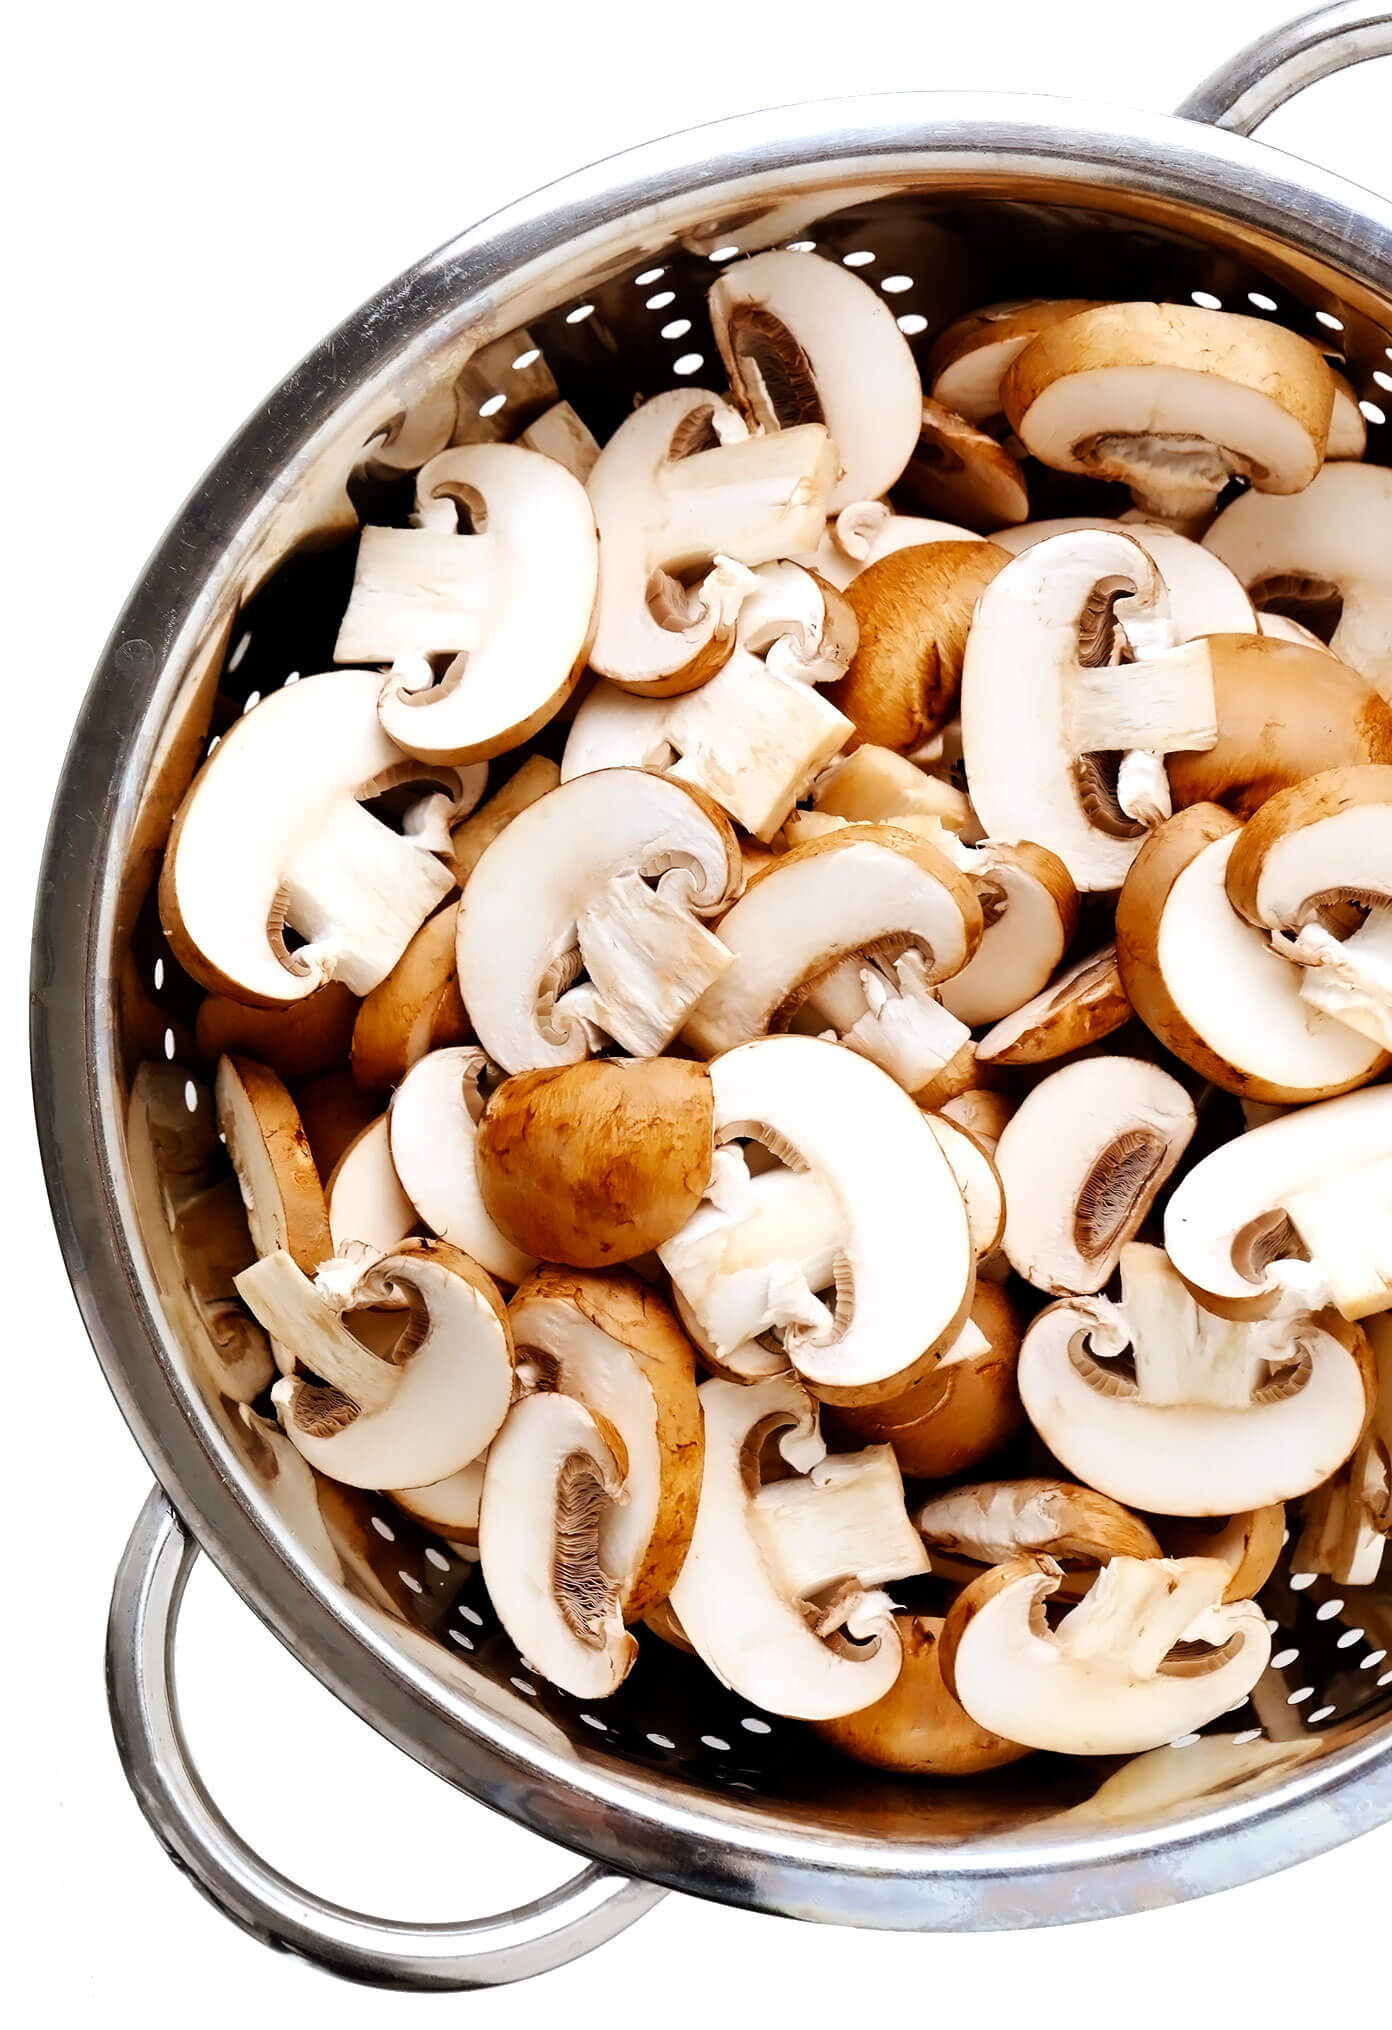 Baby Bella (Cremini) Mushrooms In Strainer